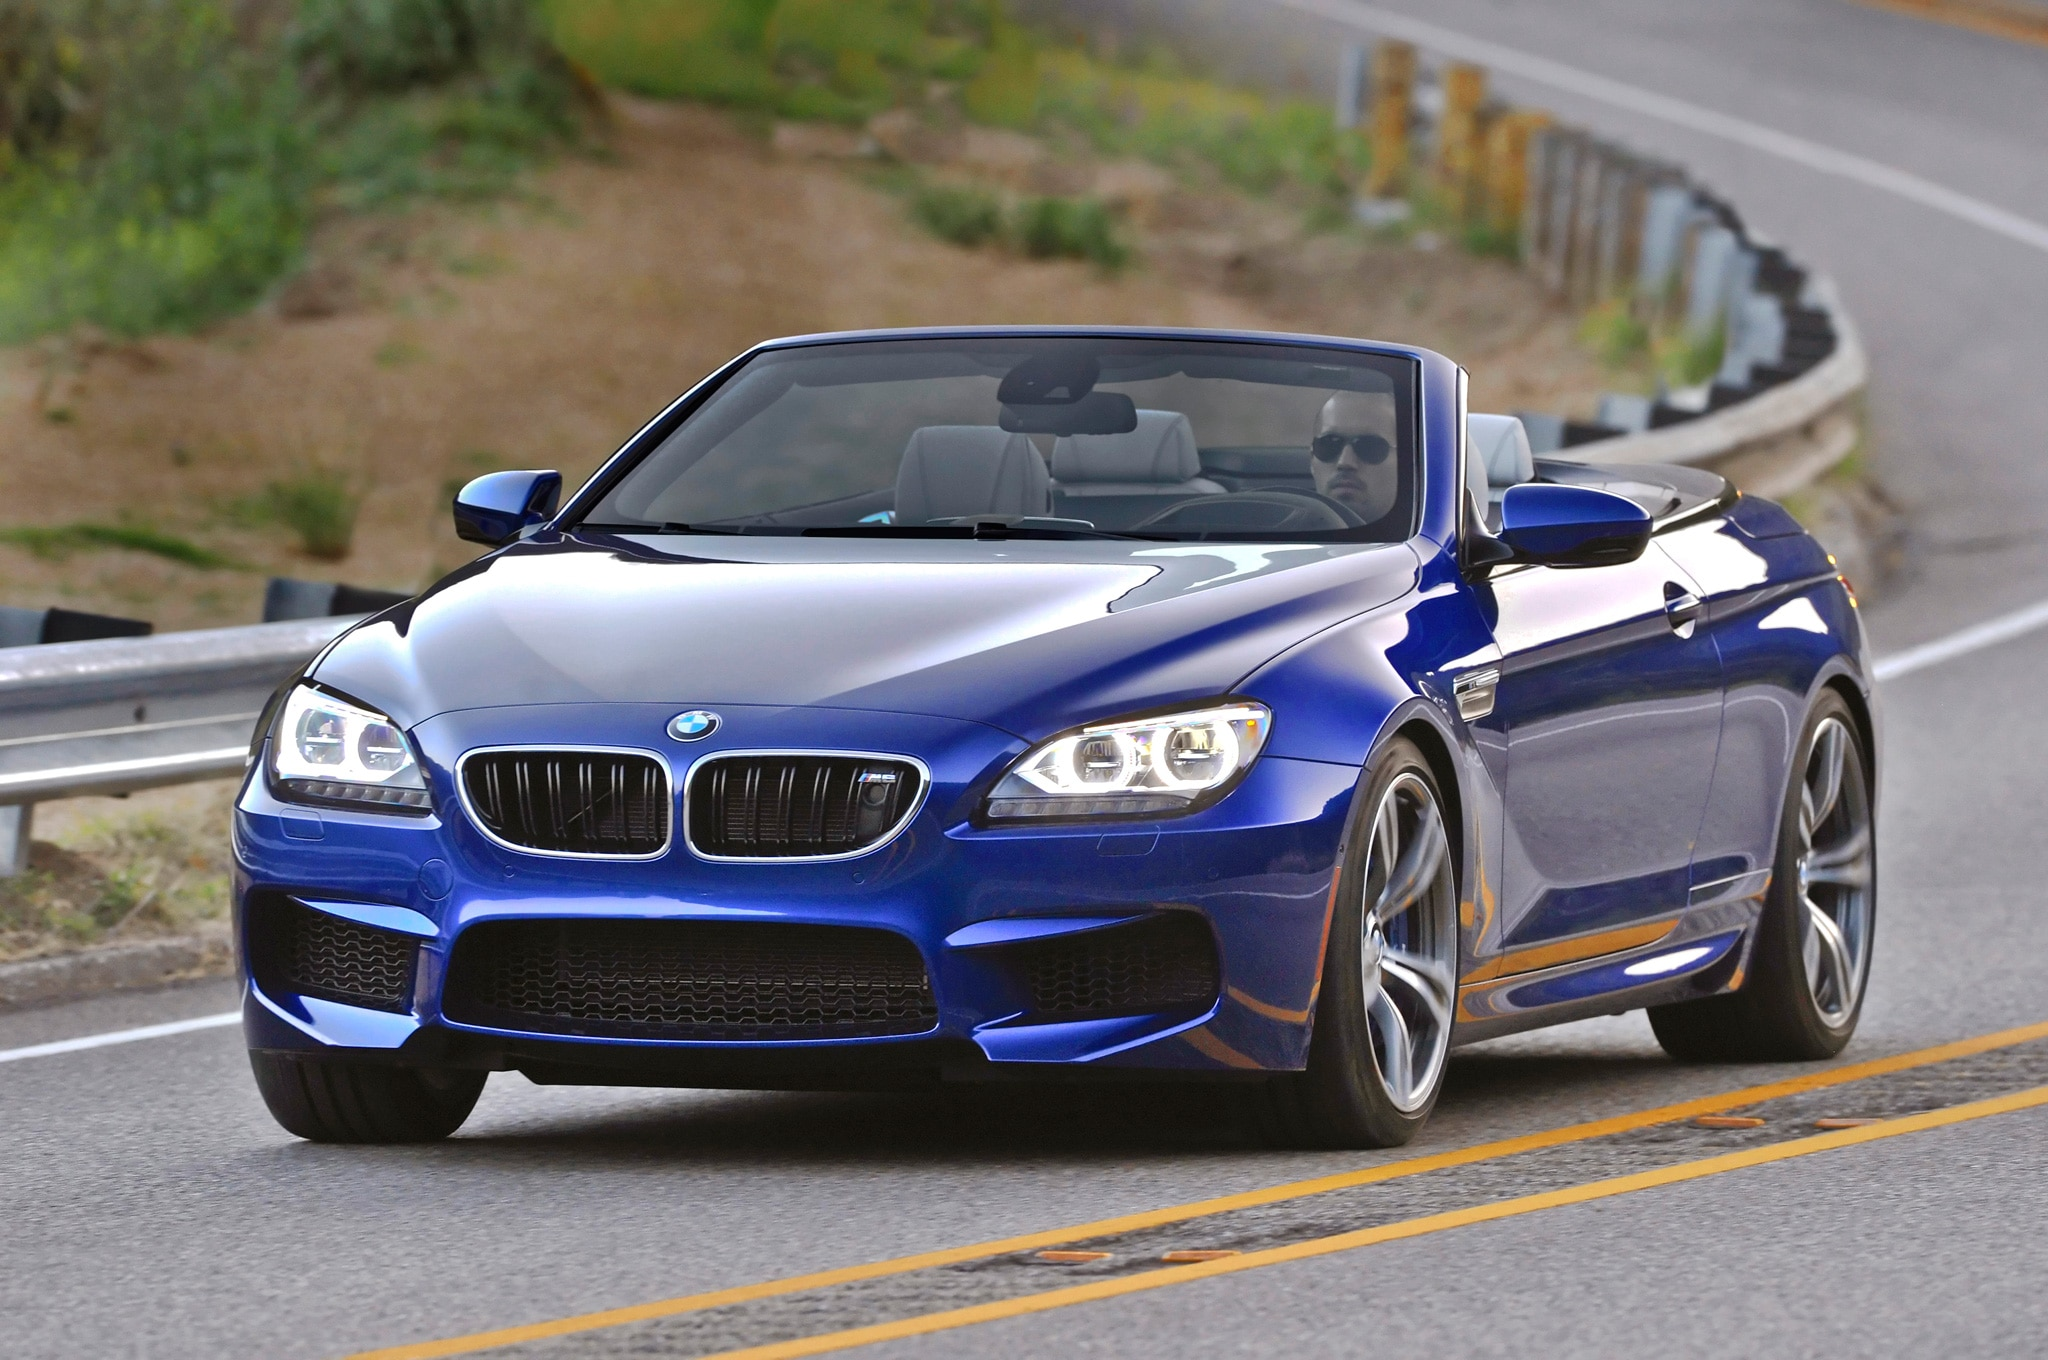 Bmw M6 0 60 >> Lumma Design's Custom BMW M6 Is Wide and Wild